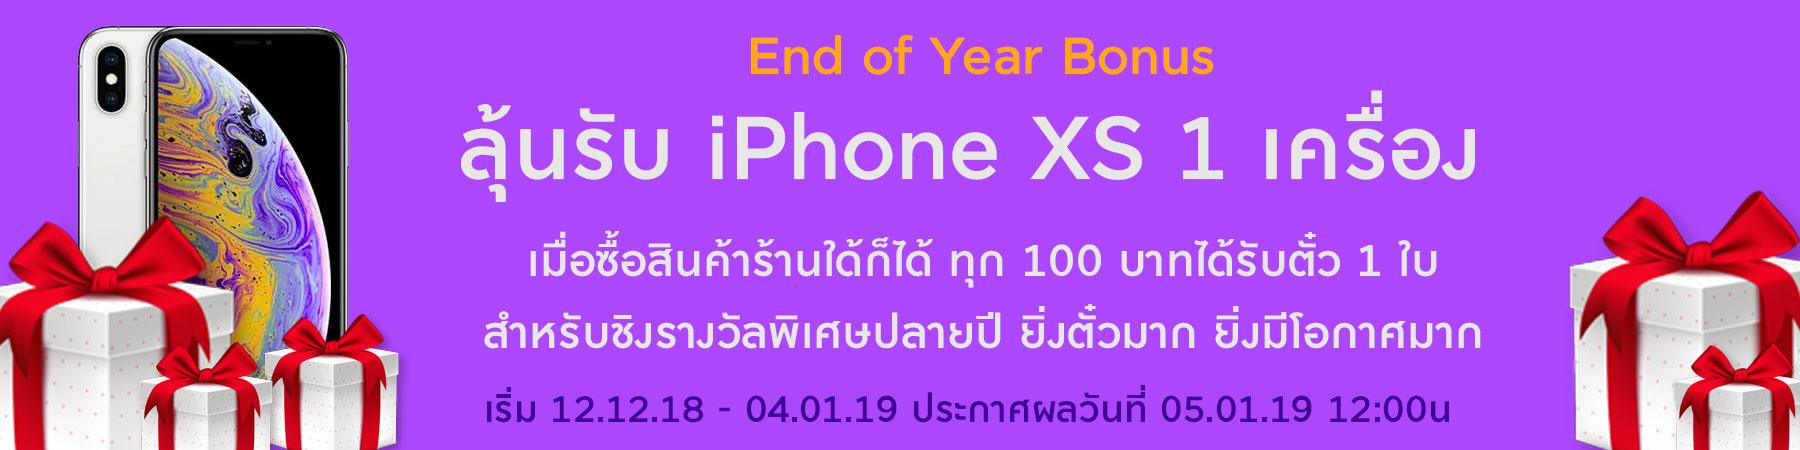 End year bonus